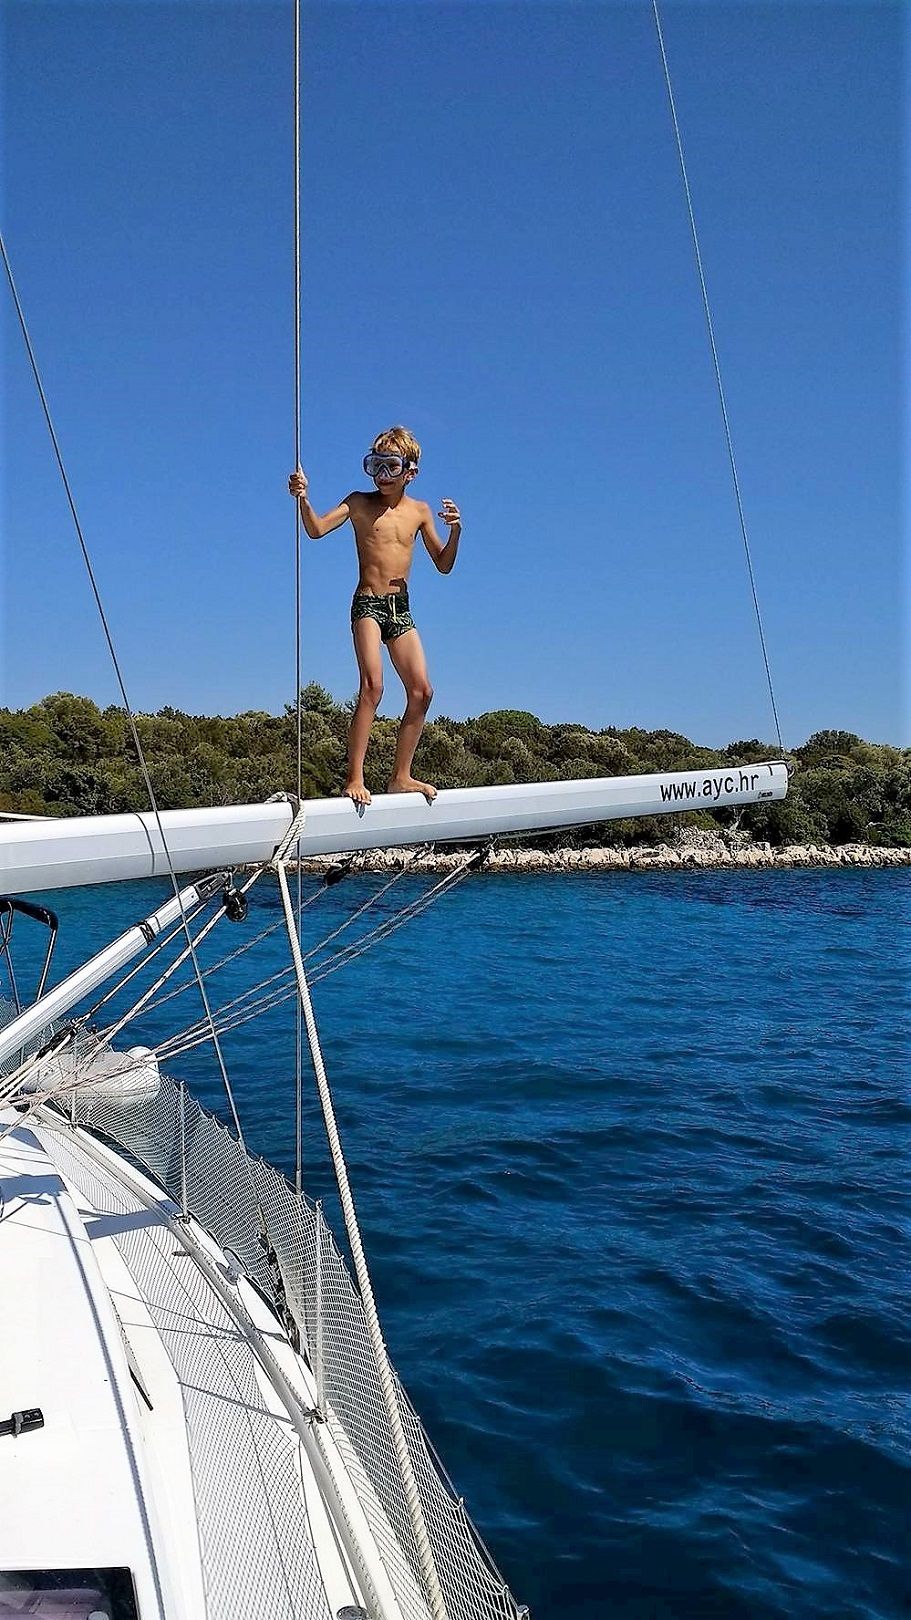 Sailfriends flottieljes zwemplezier